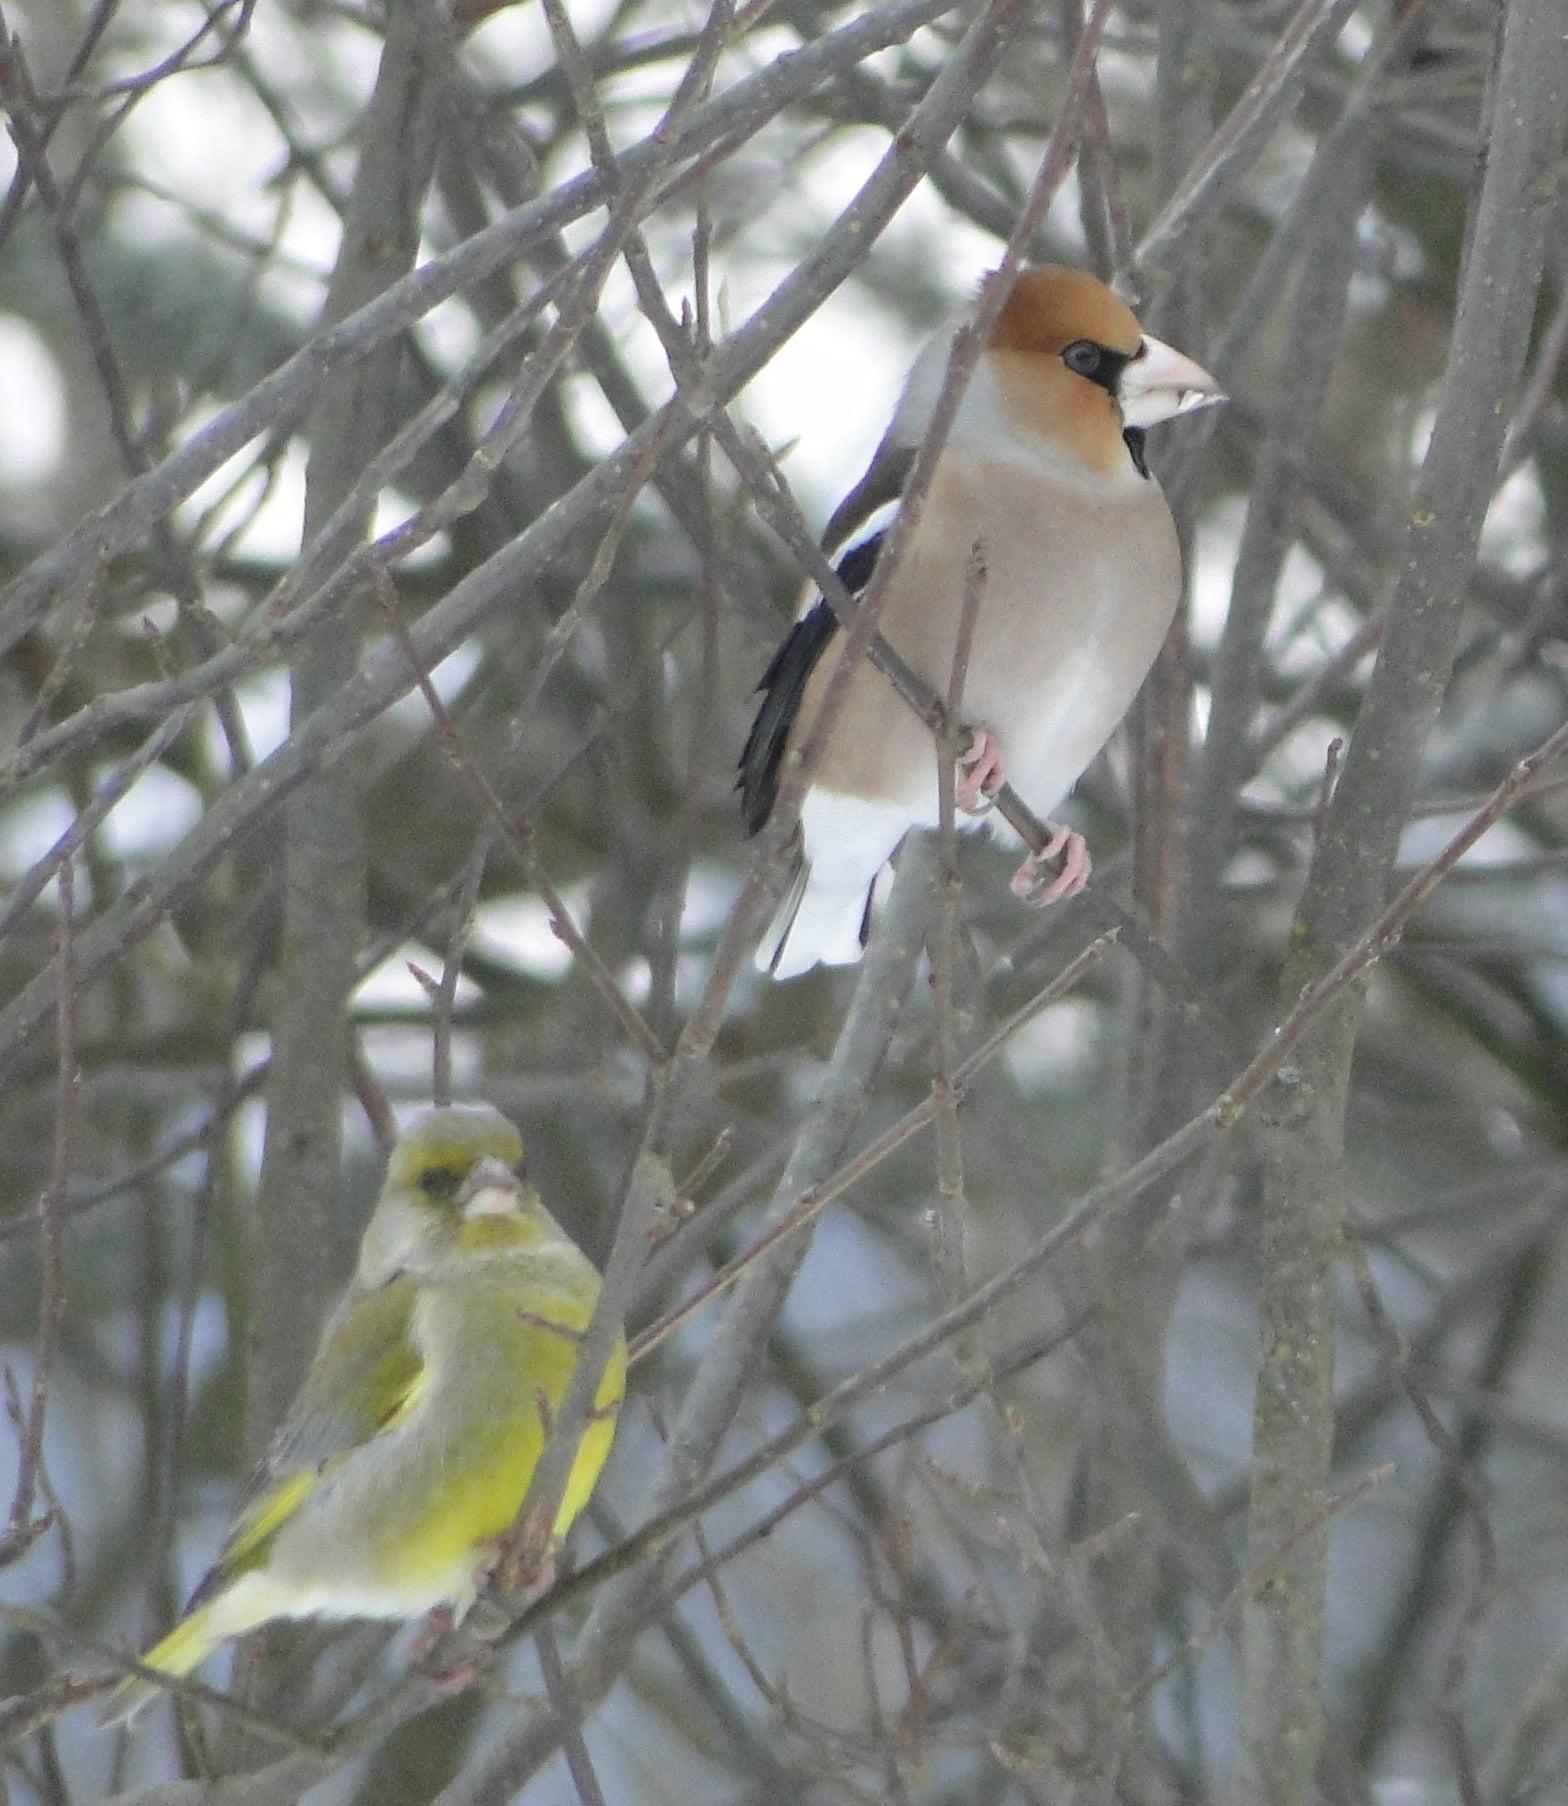 Nasi zimowi ptasi przyjaciele 7